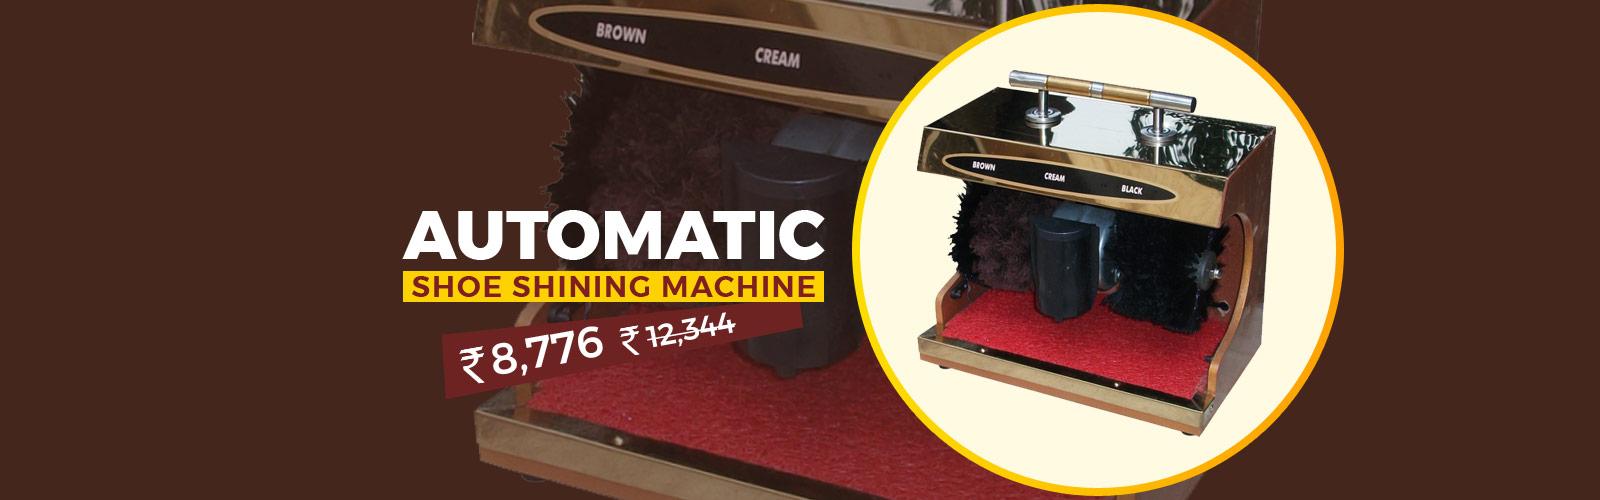 Shoe Shine Machine <span> For Shiny Shoes